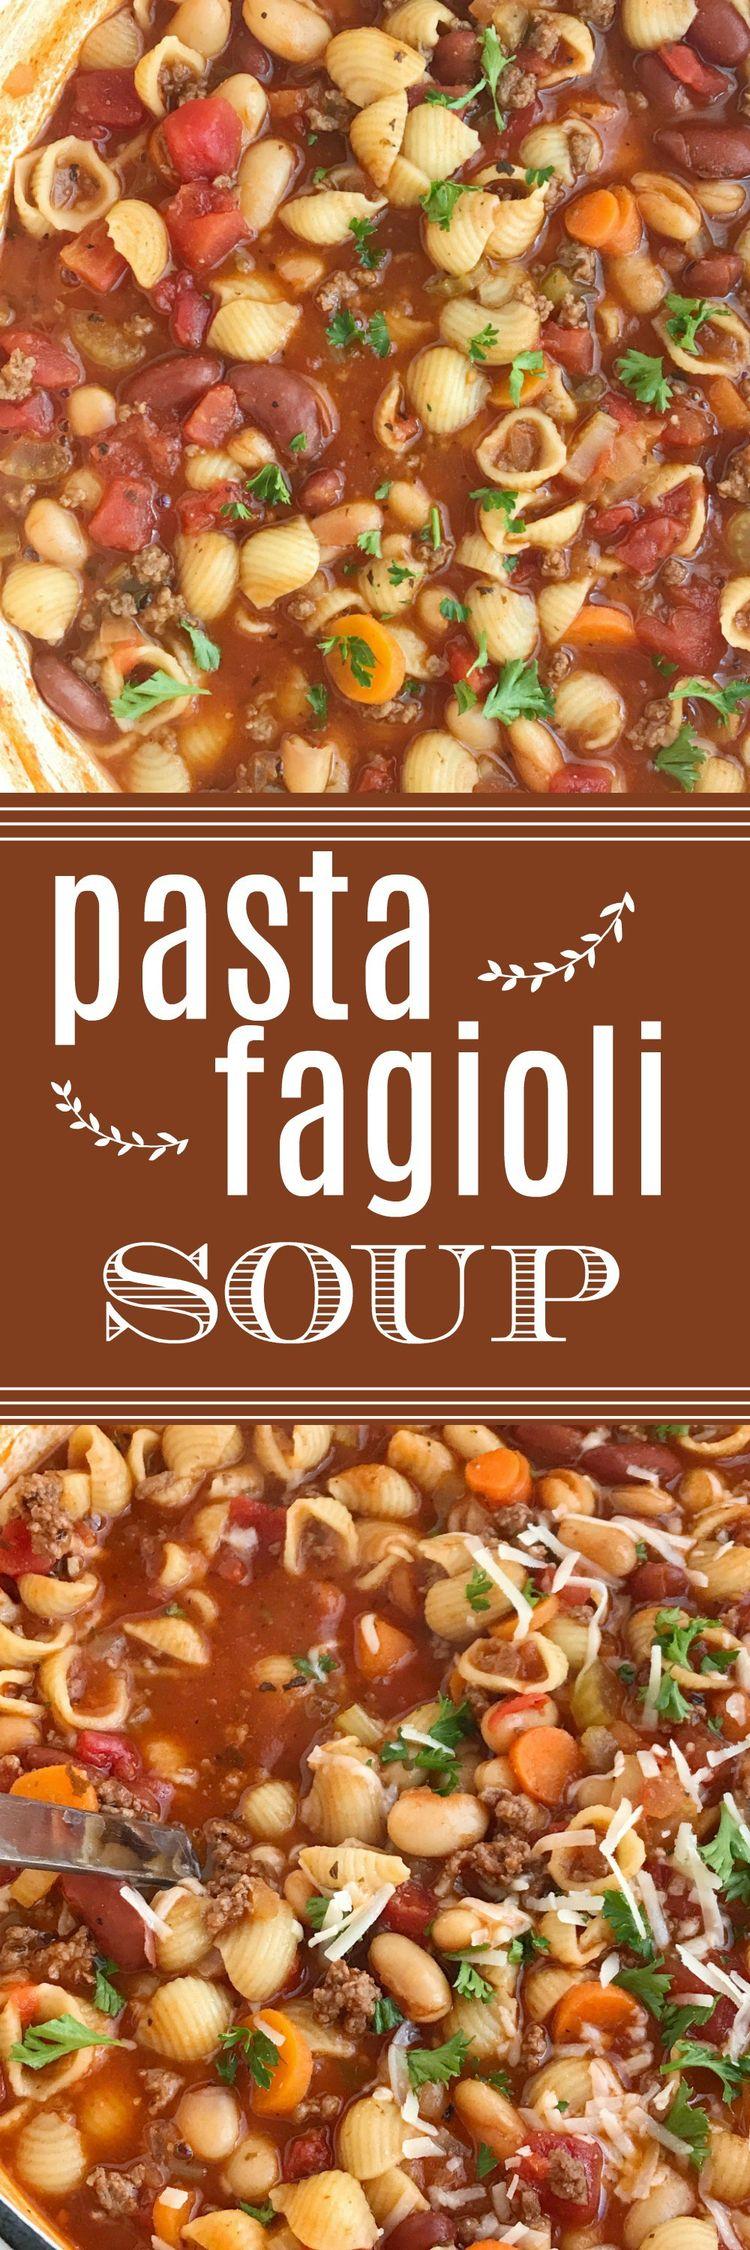 Pasta Fagioli Soup | Olive Garden Copycat Fagioli Soup | S